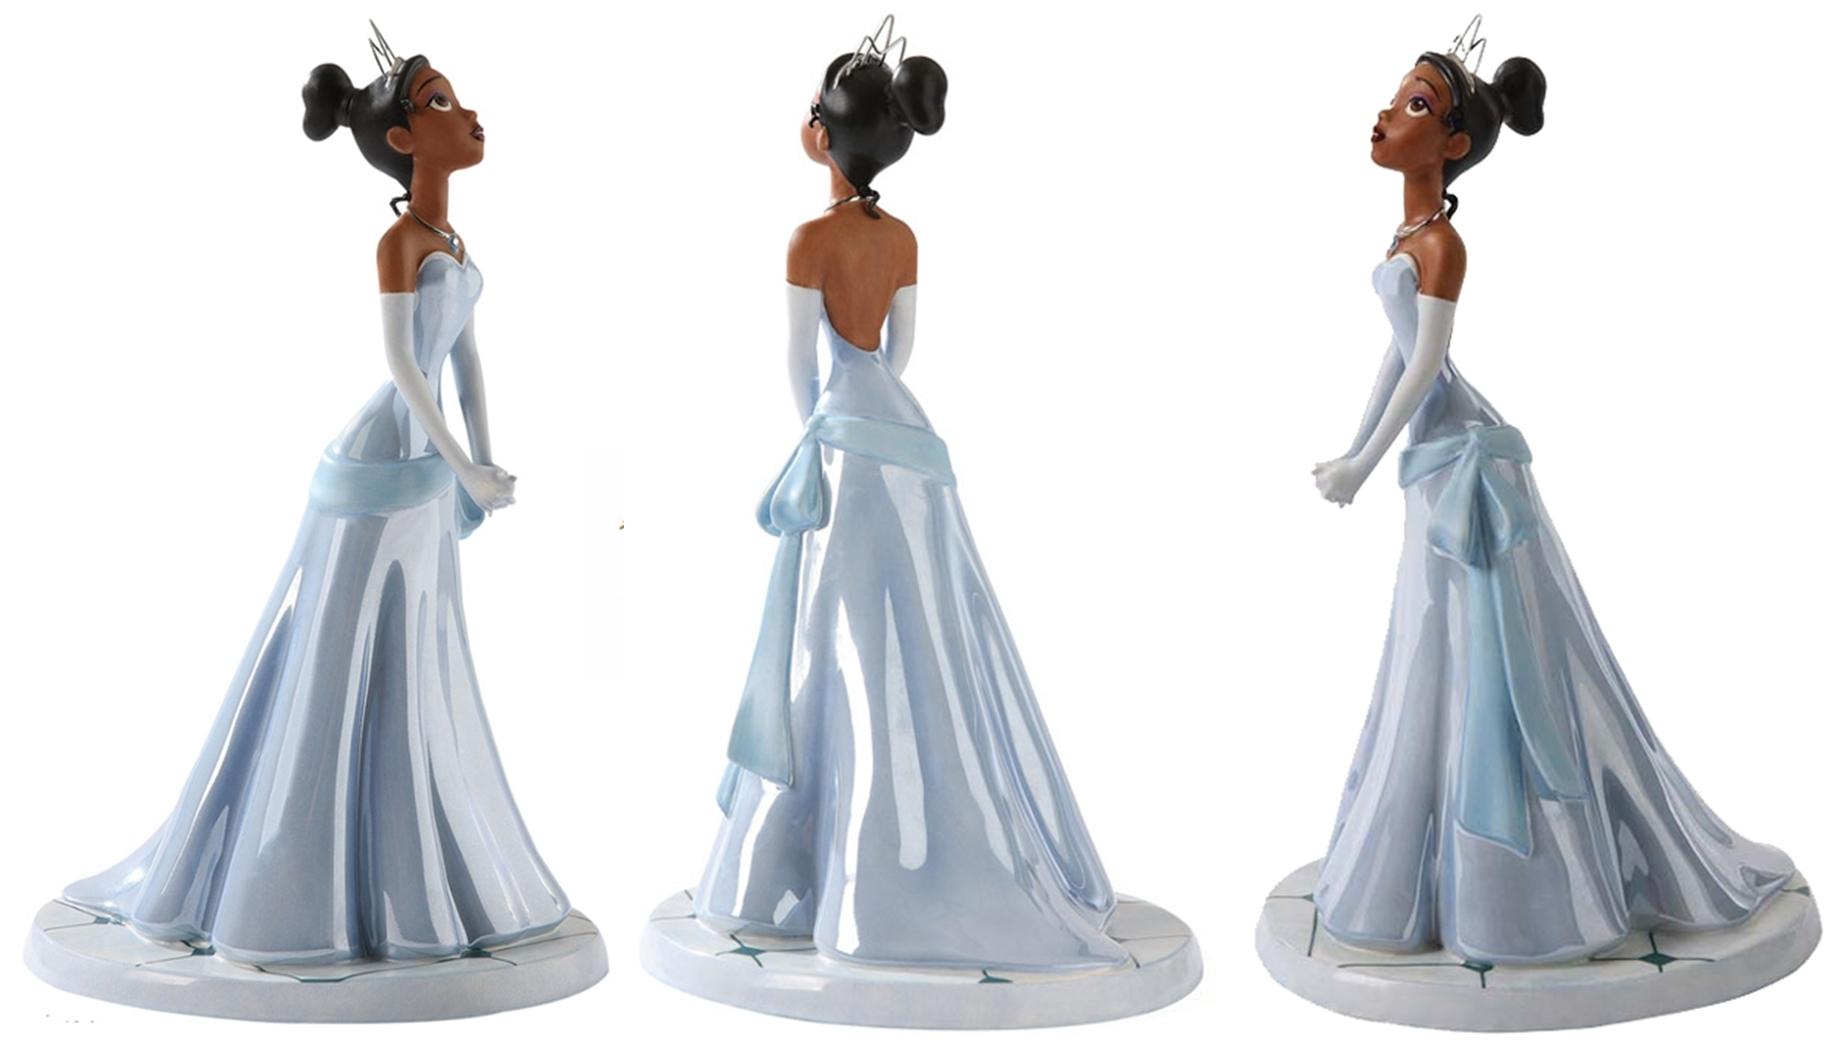 Walt Disney Figurines - Princess Tiana